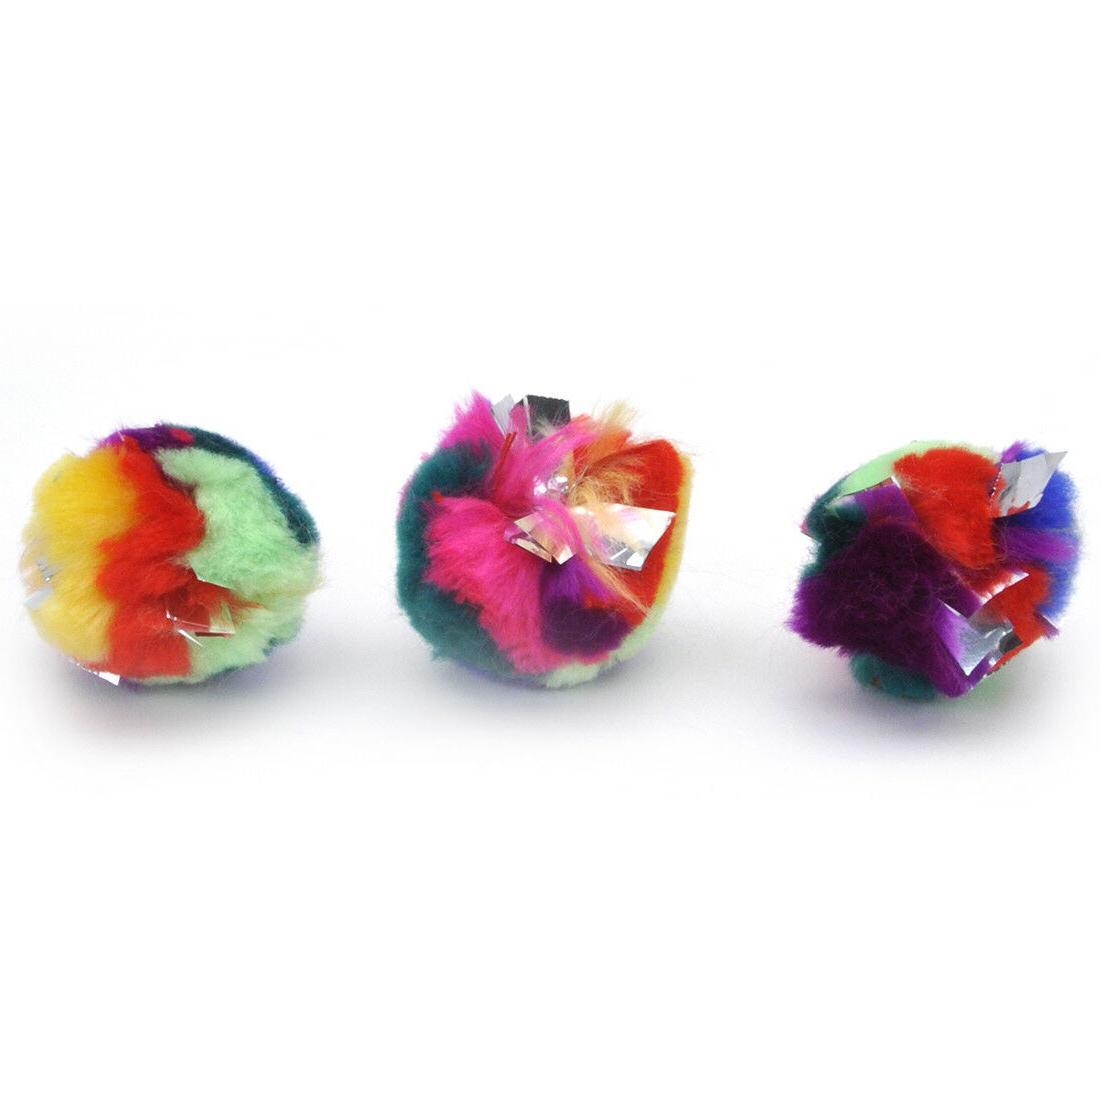 crinkle balls cat toys lots 5 10